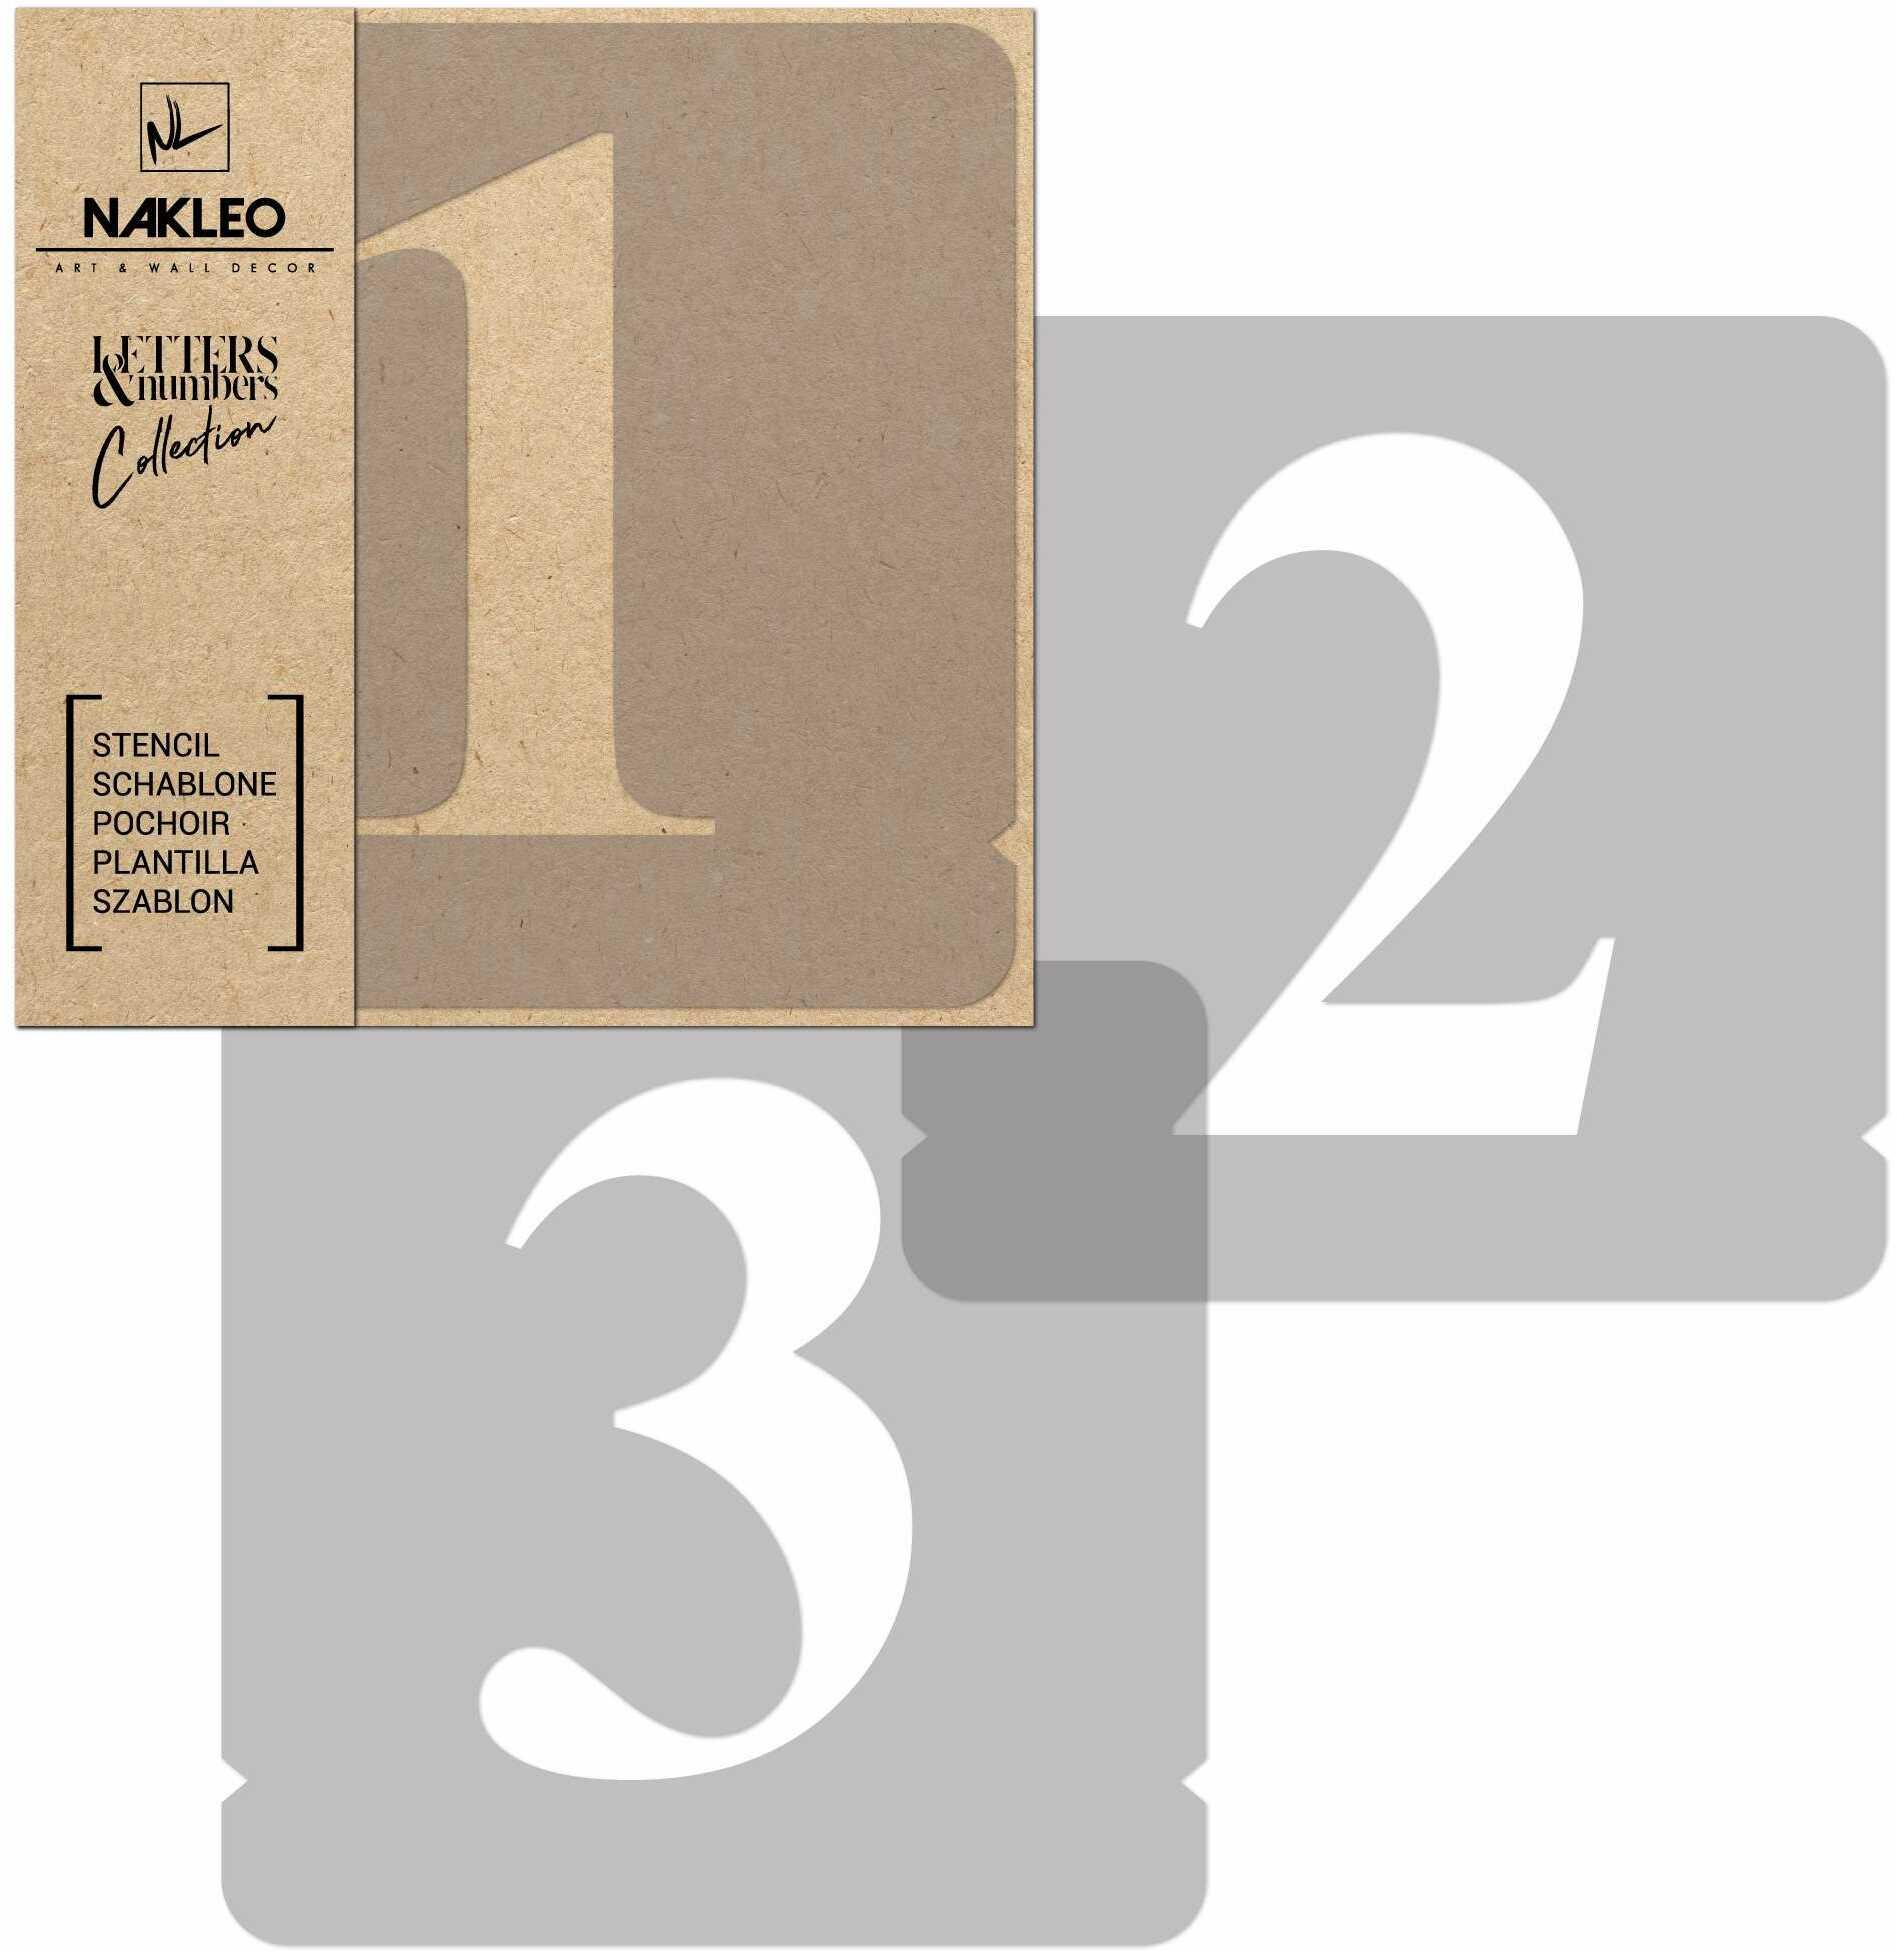 szablon malarski wielokrotny // cyfry 70 mm // Times Roman Cyfry